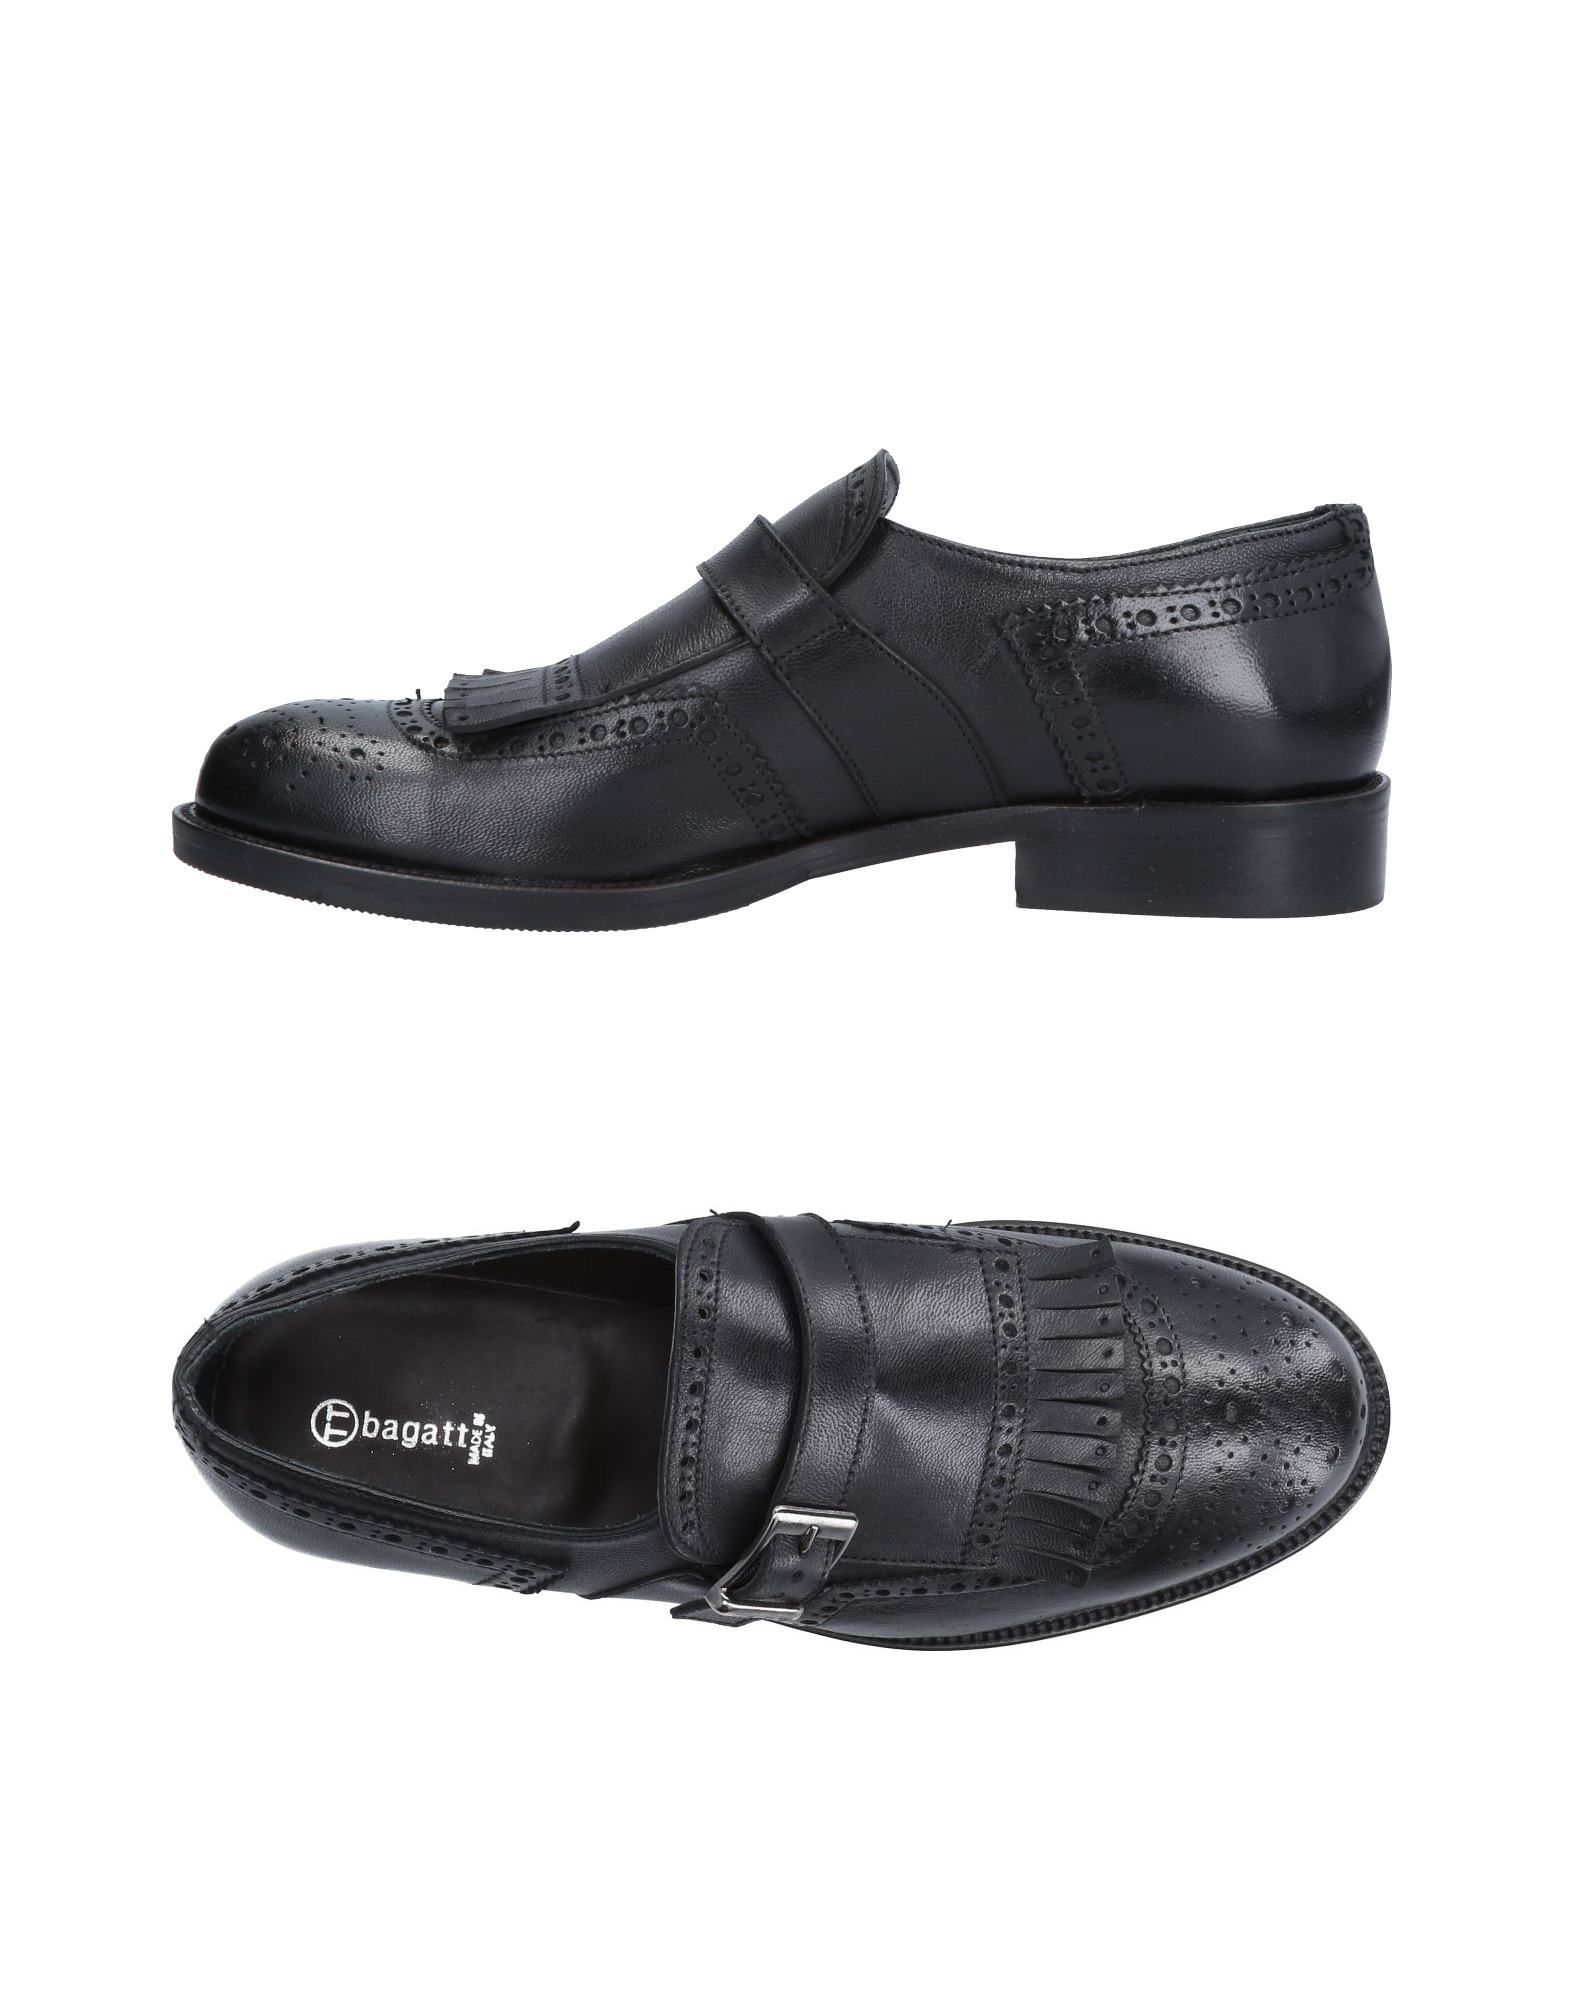 Rabatt Bagatt echte Schuhe Bagatt Rabatt Mokassins Herren  11510142JP 7bd95b